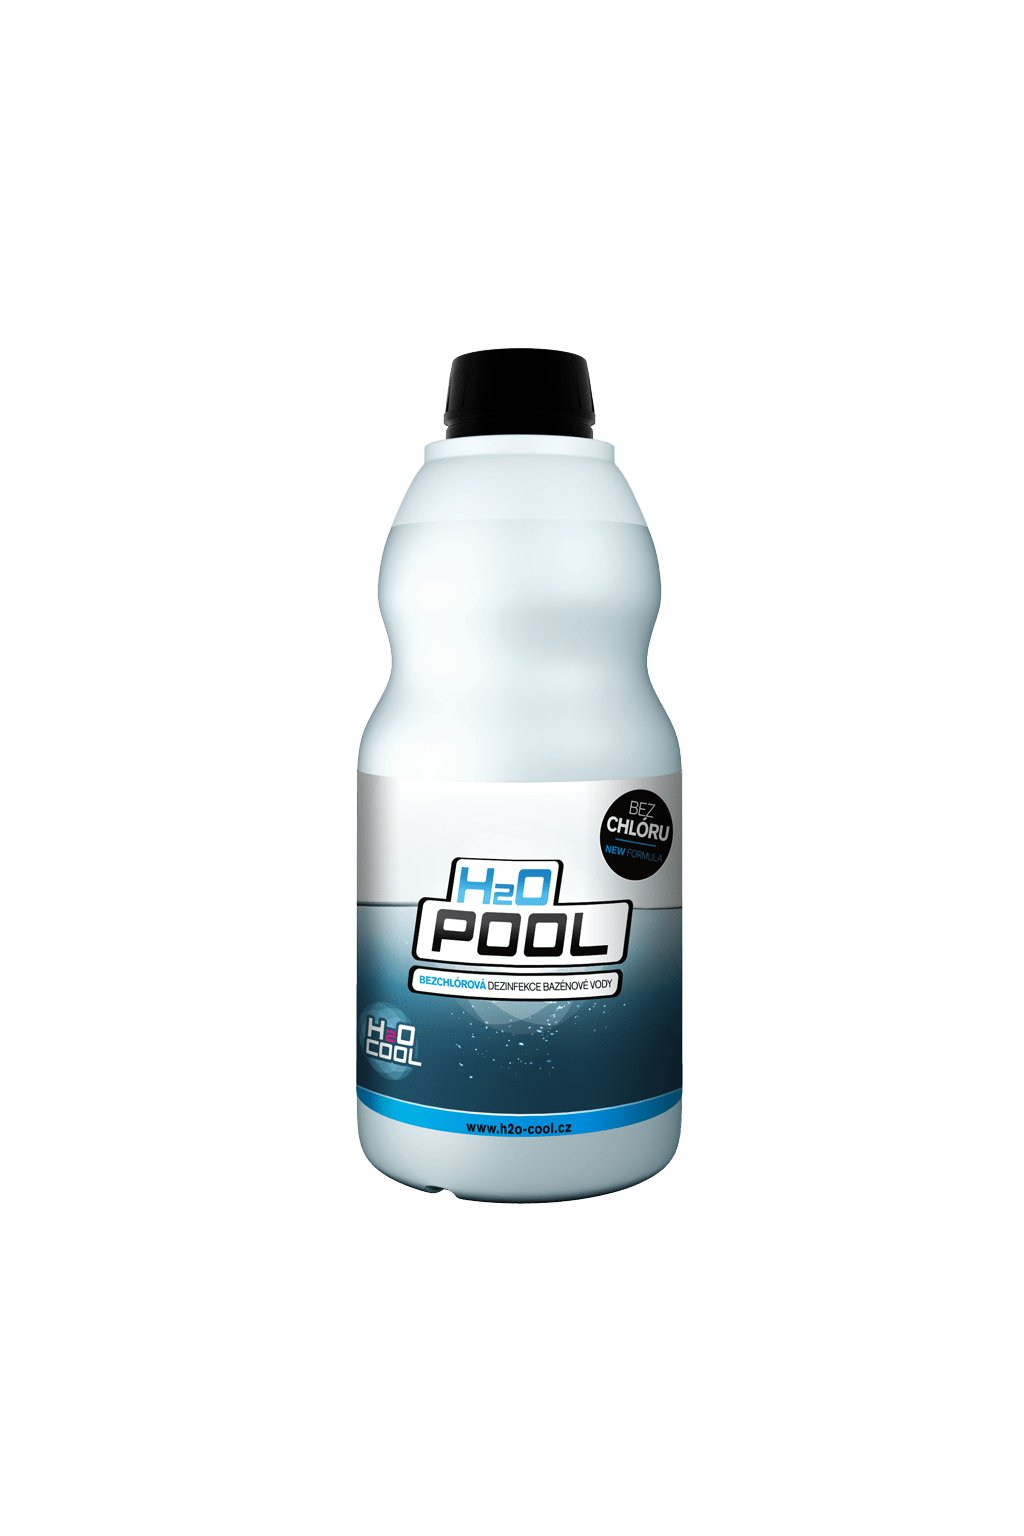 9 bezchlorova dezinfekce bazenove vody h2o pool 2018